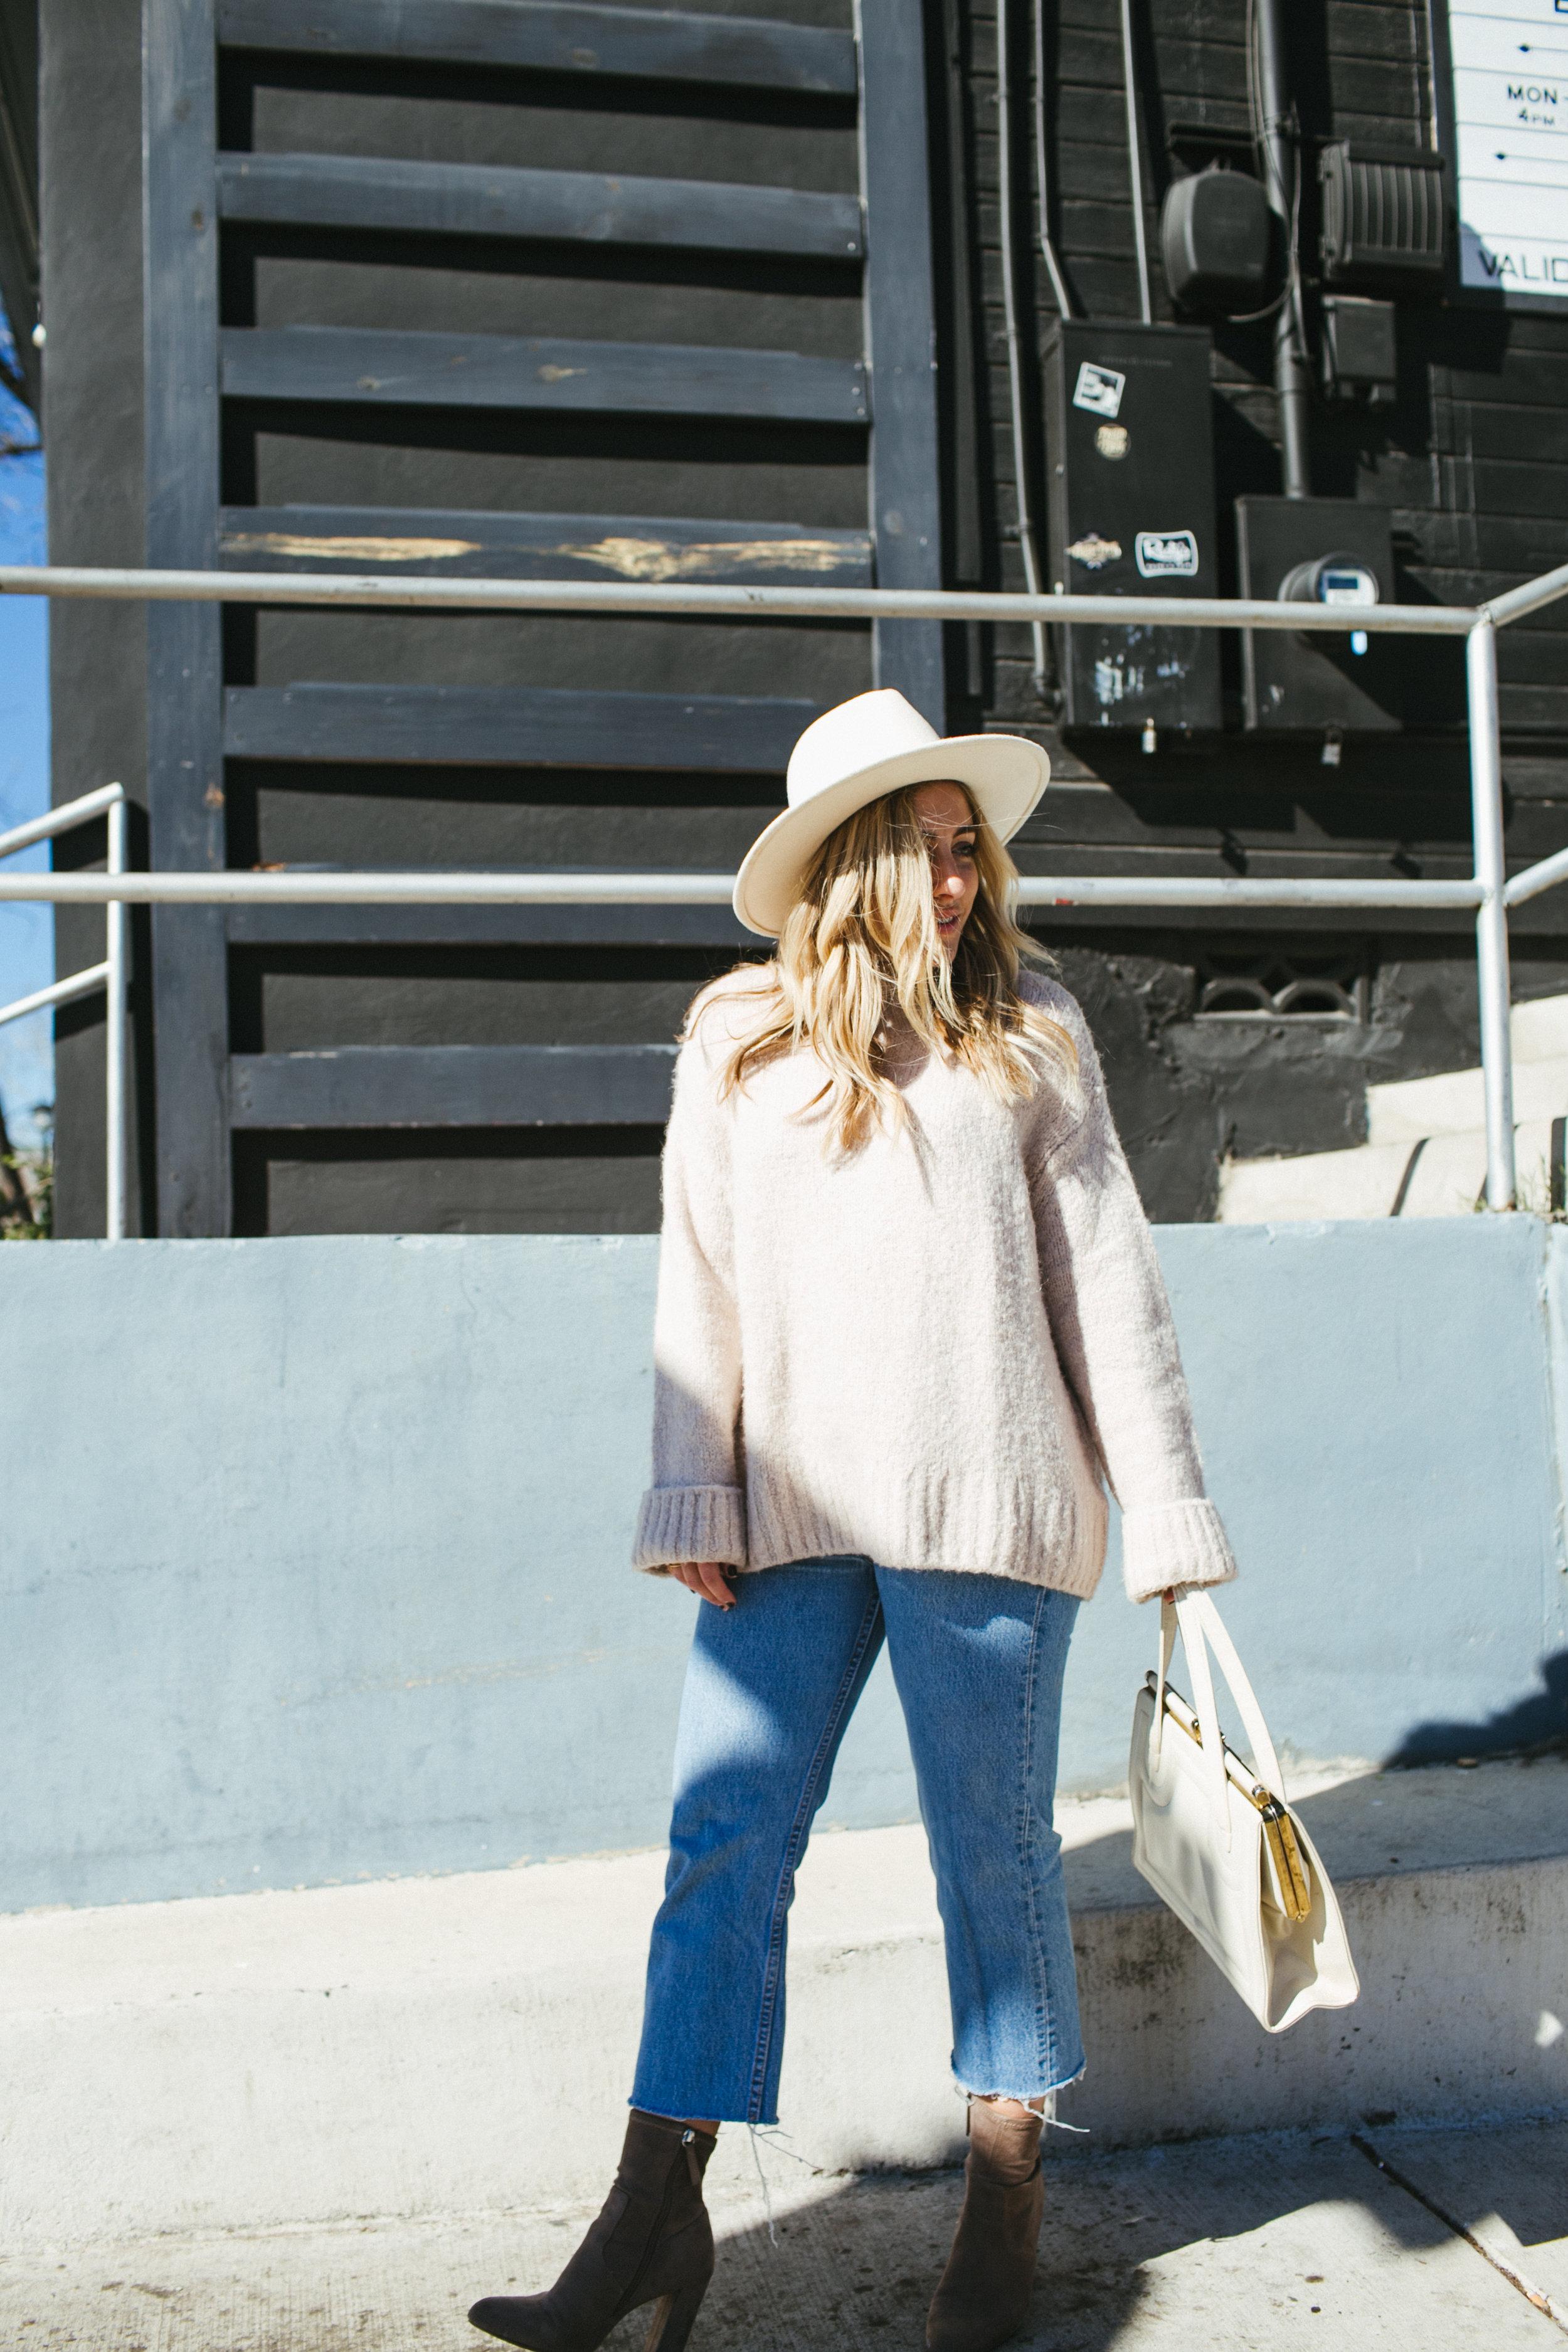 Paige-Newton-Lifestyle-Fashion-Blogger-Influencer-Photography-057.jpg